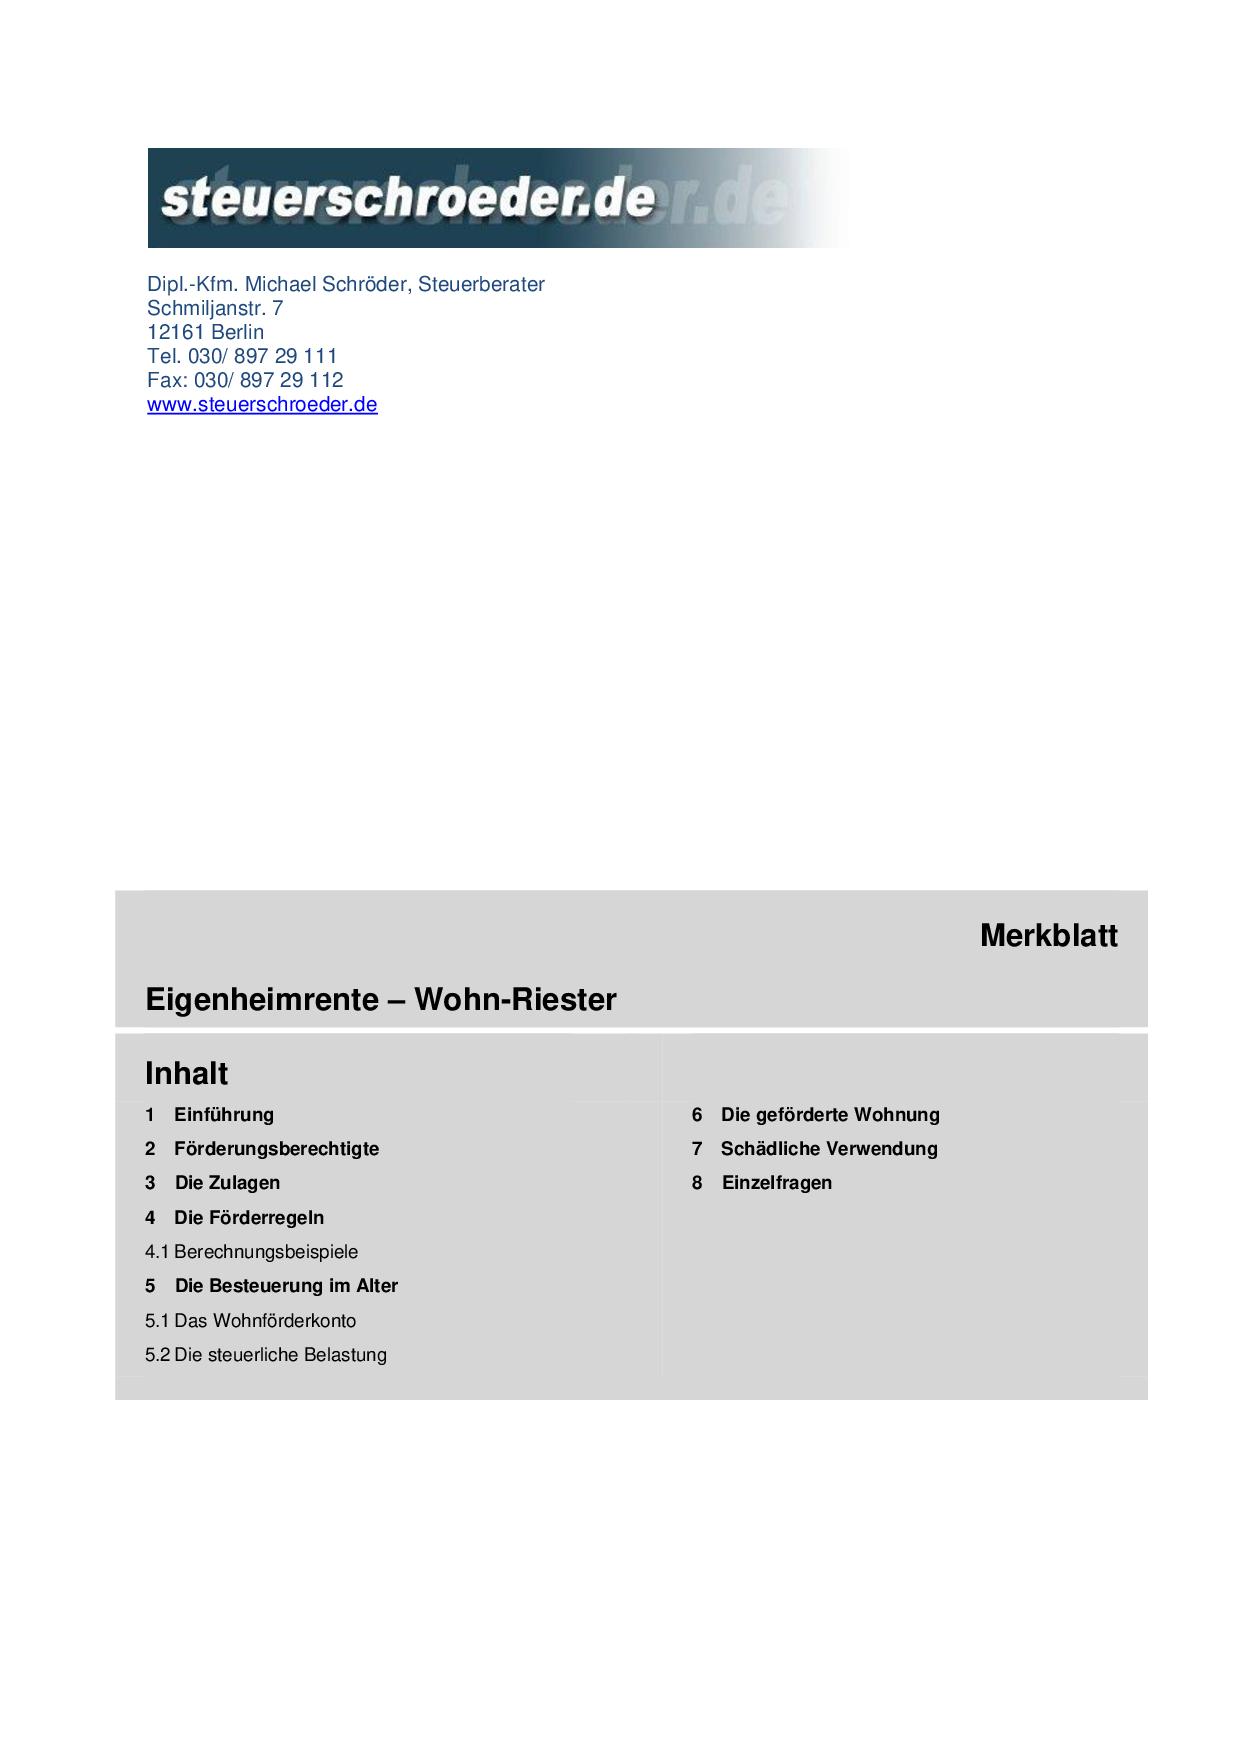 Wohn-Riester (Eigenheimrente)